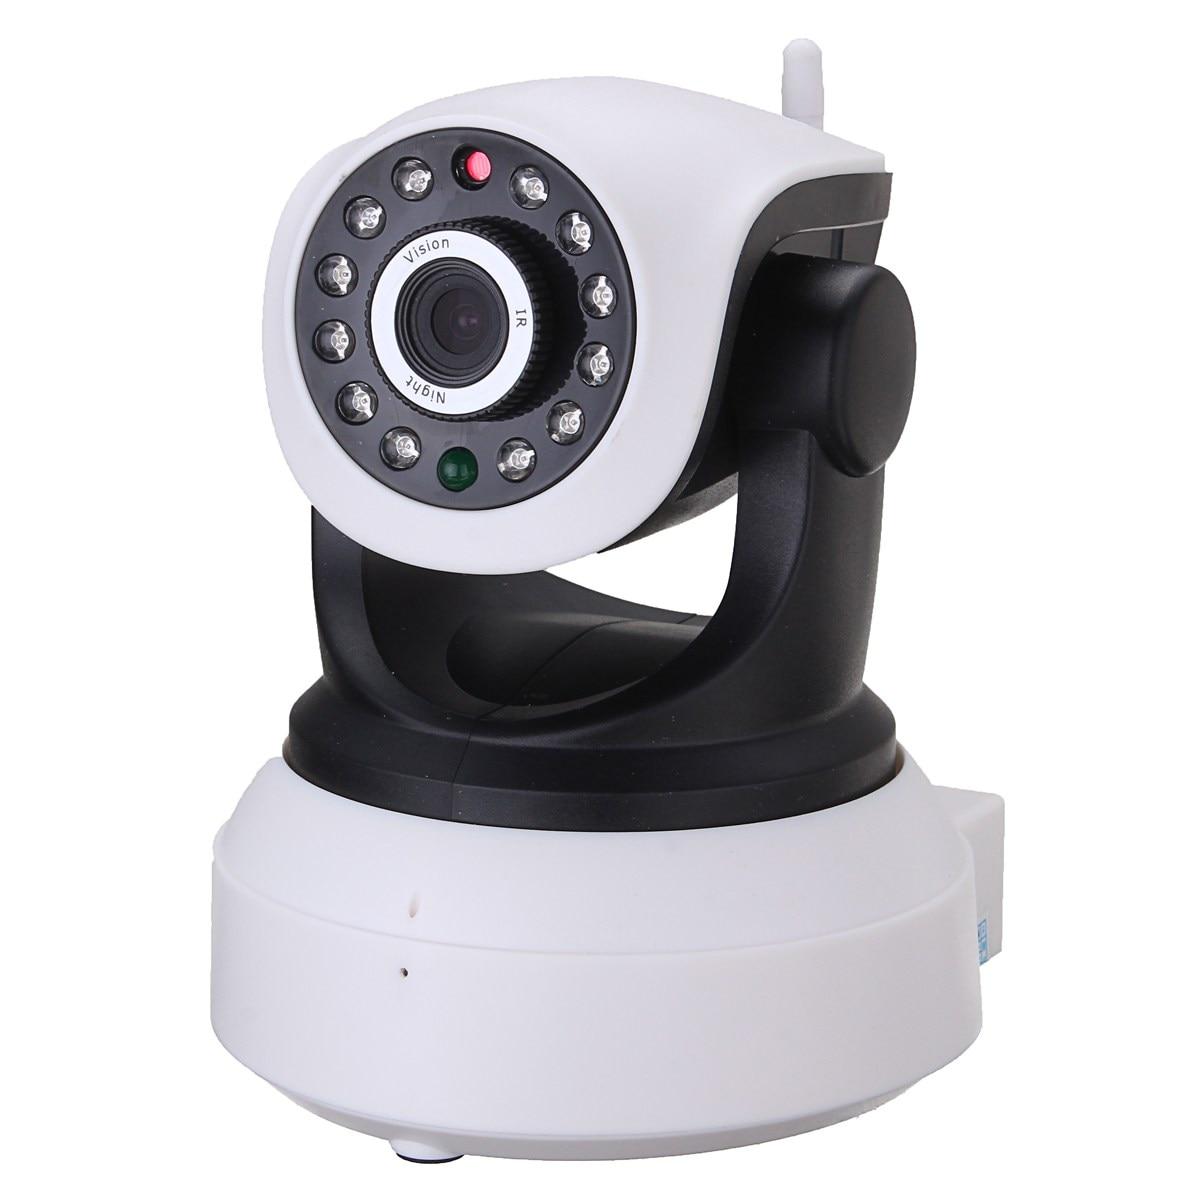 Safurance Wireless IP Camera 720P Pan Tilt Network Security Night Vision WiFi Webcam Home Safety Surveillance<br>